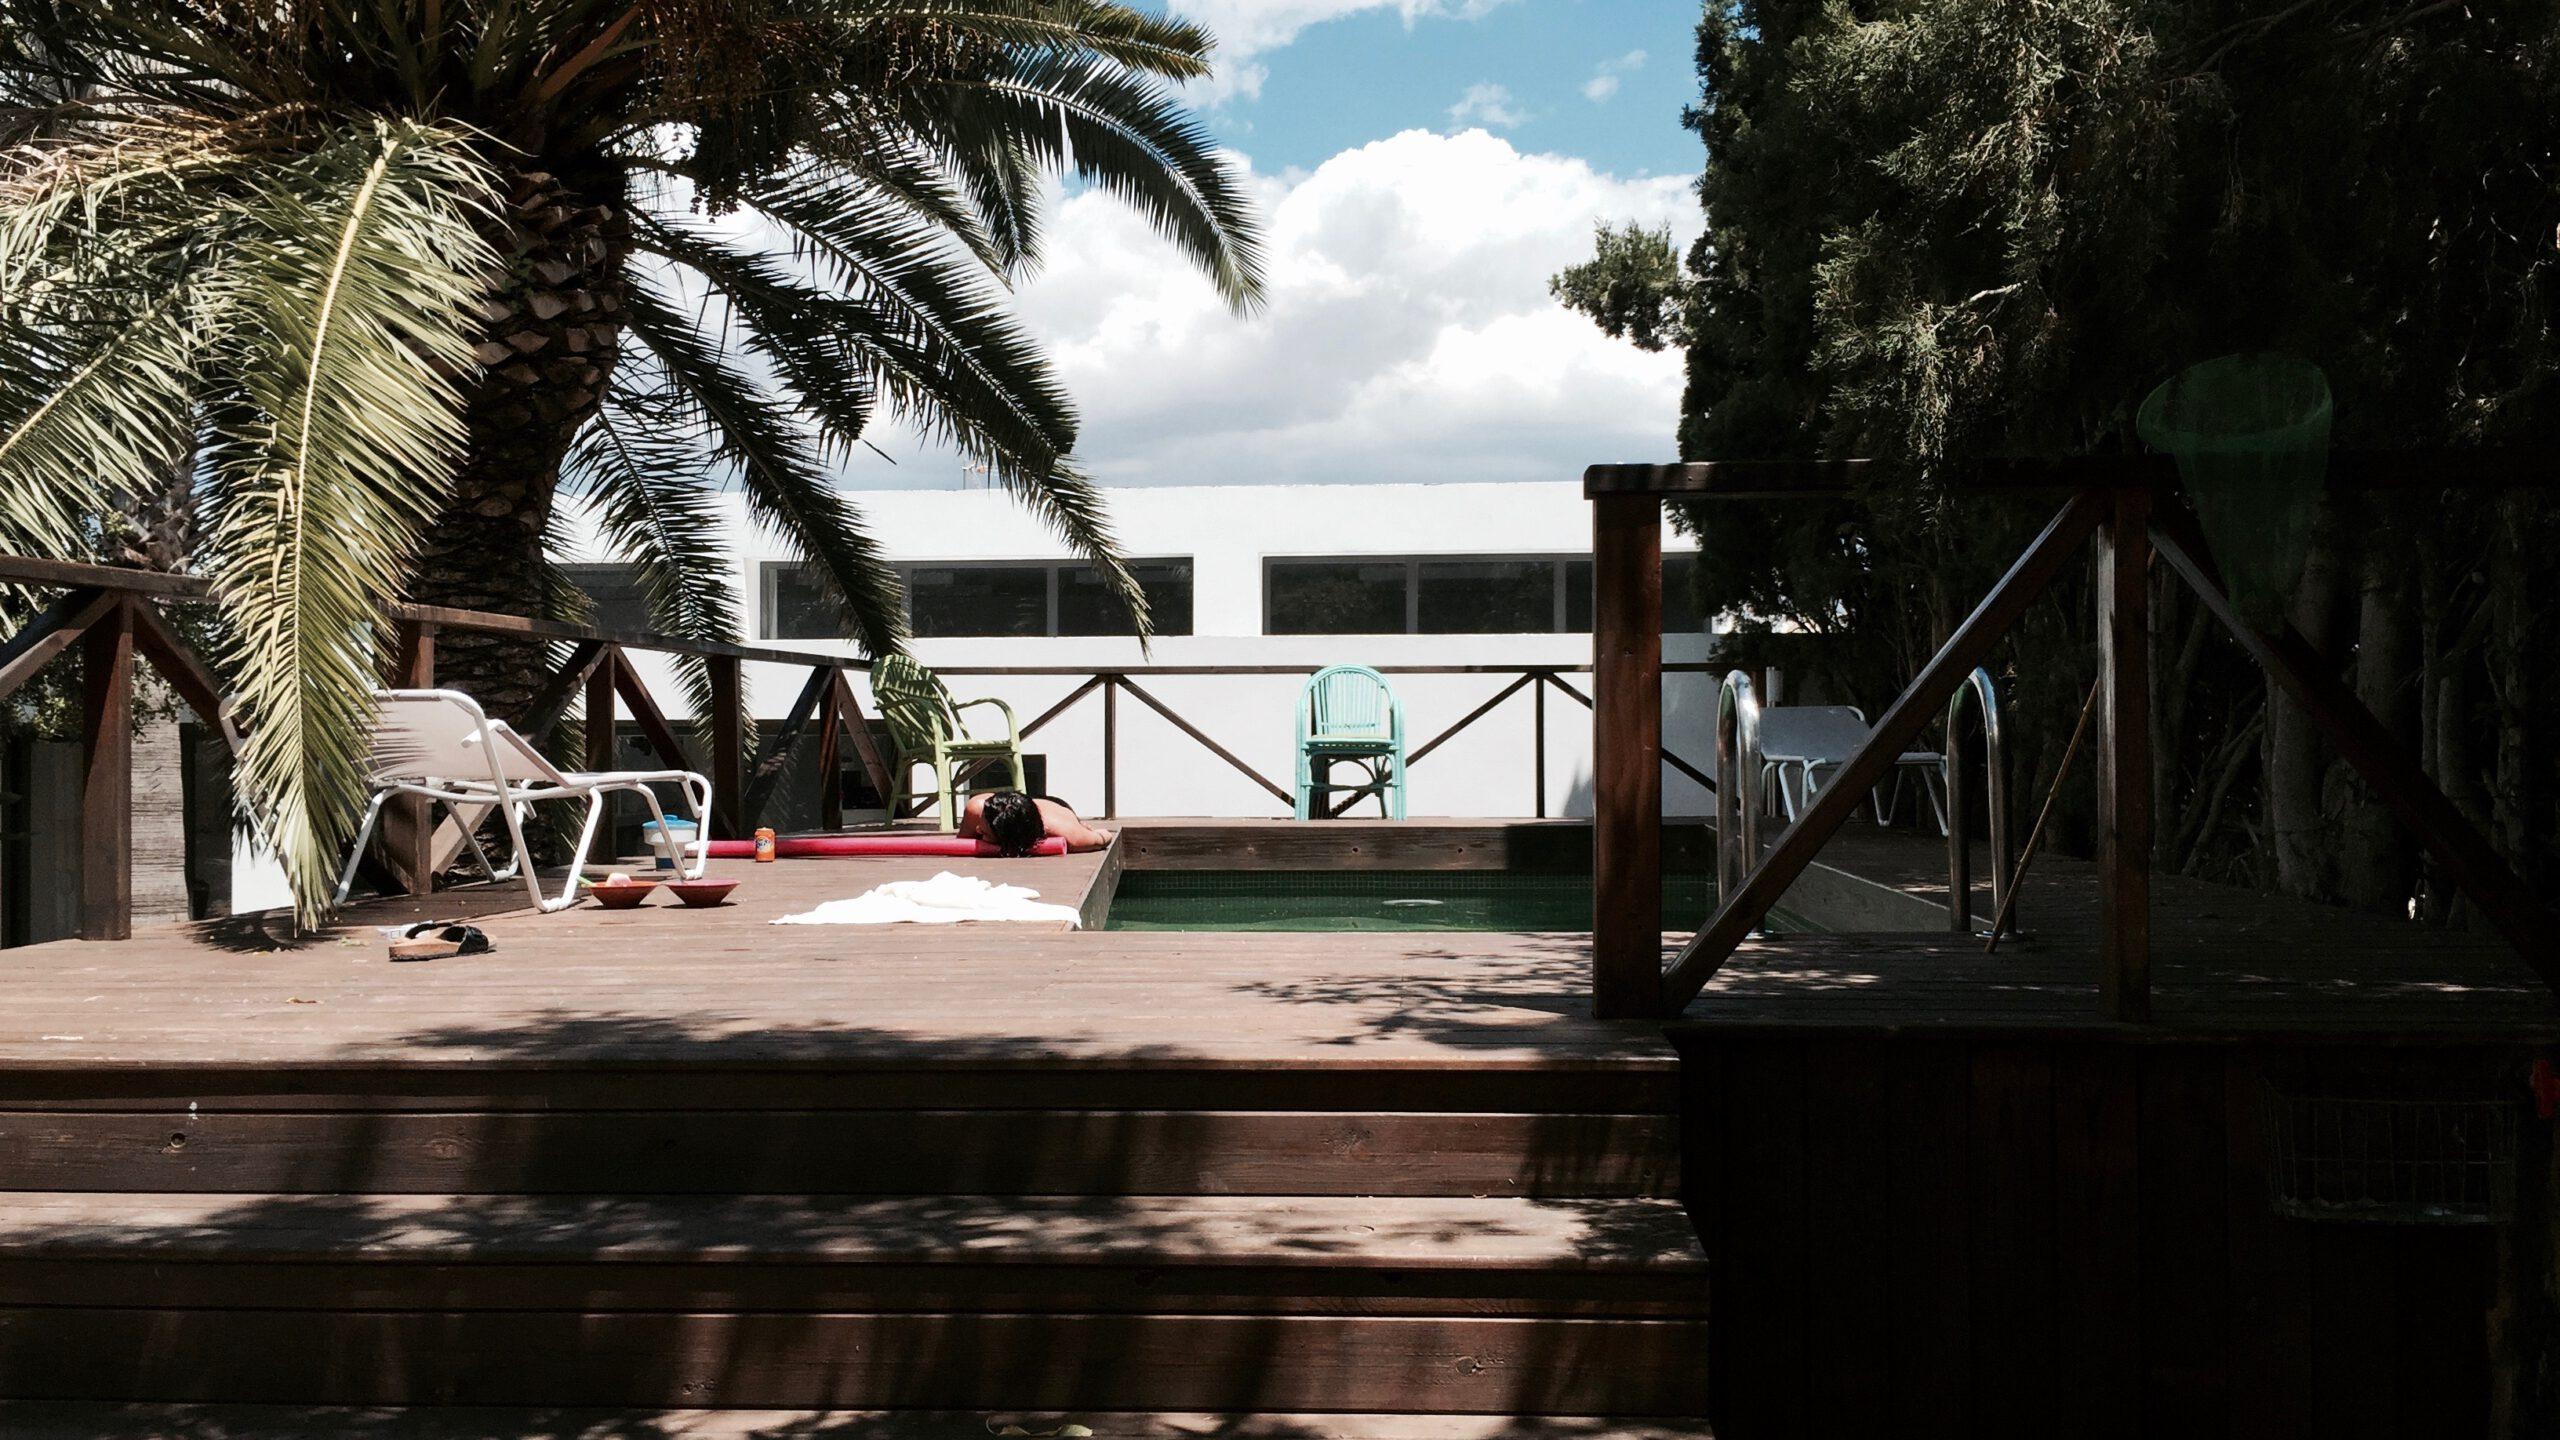 Mallorca_2015_Dara_Sepehri_4473